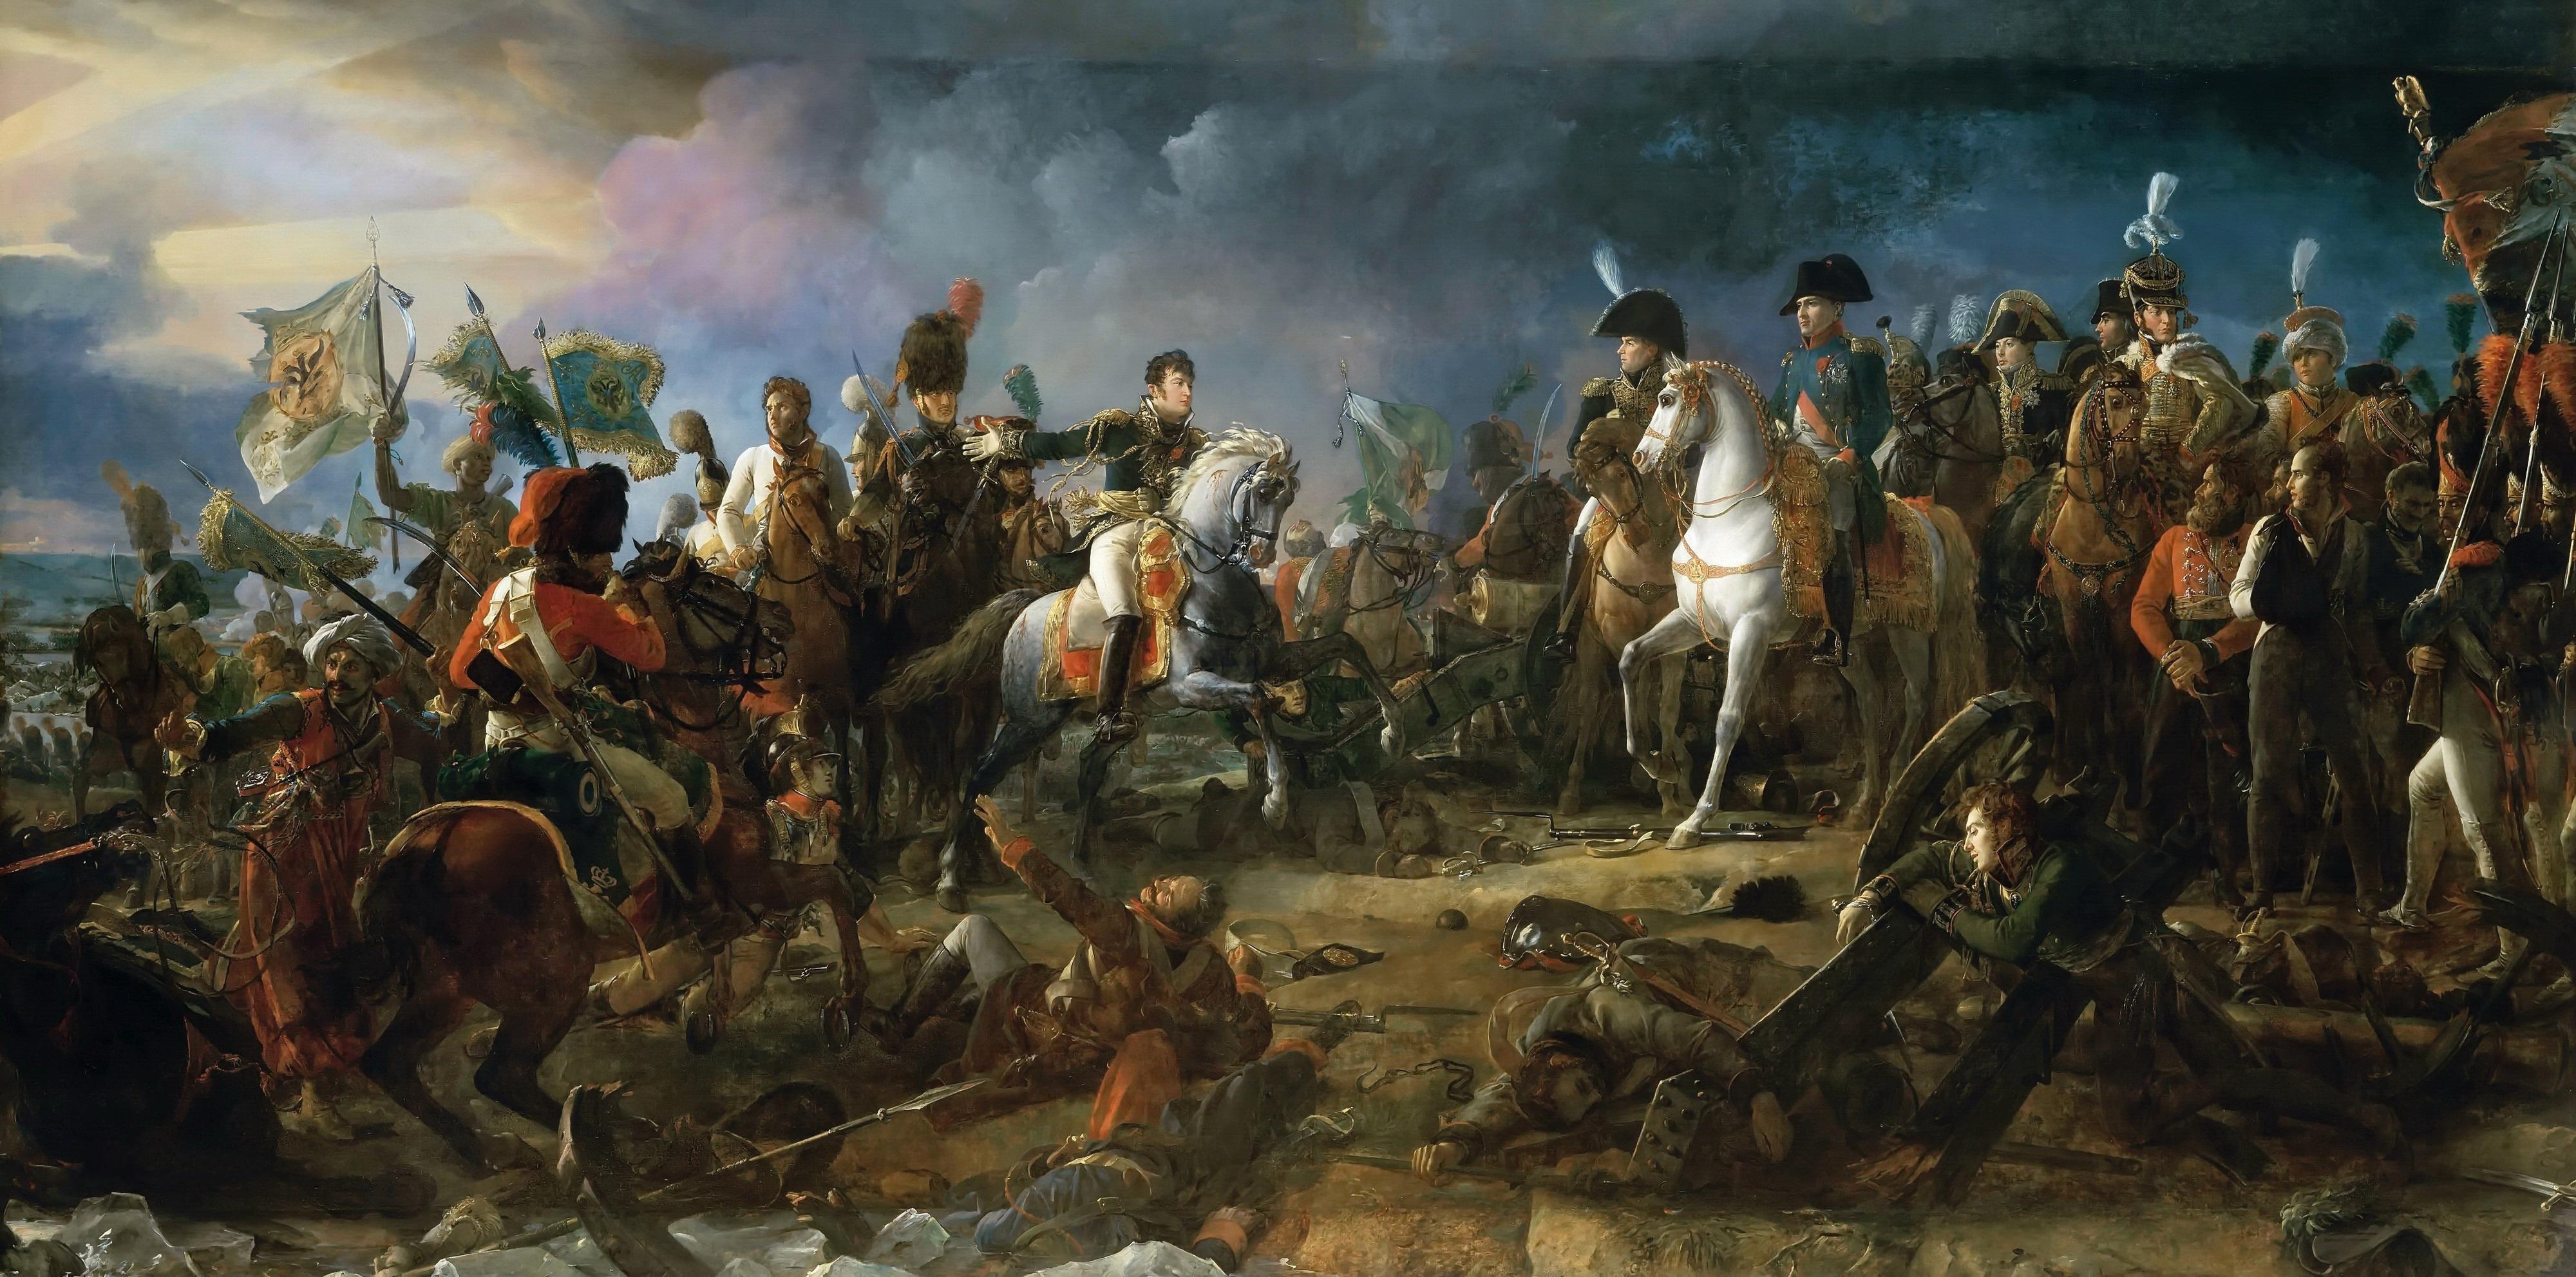 Depiction of Batalla de Austerlitz